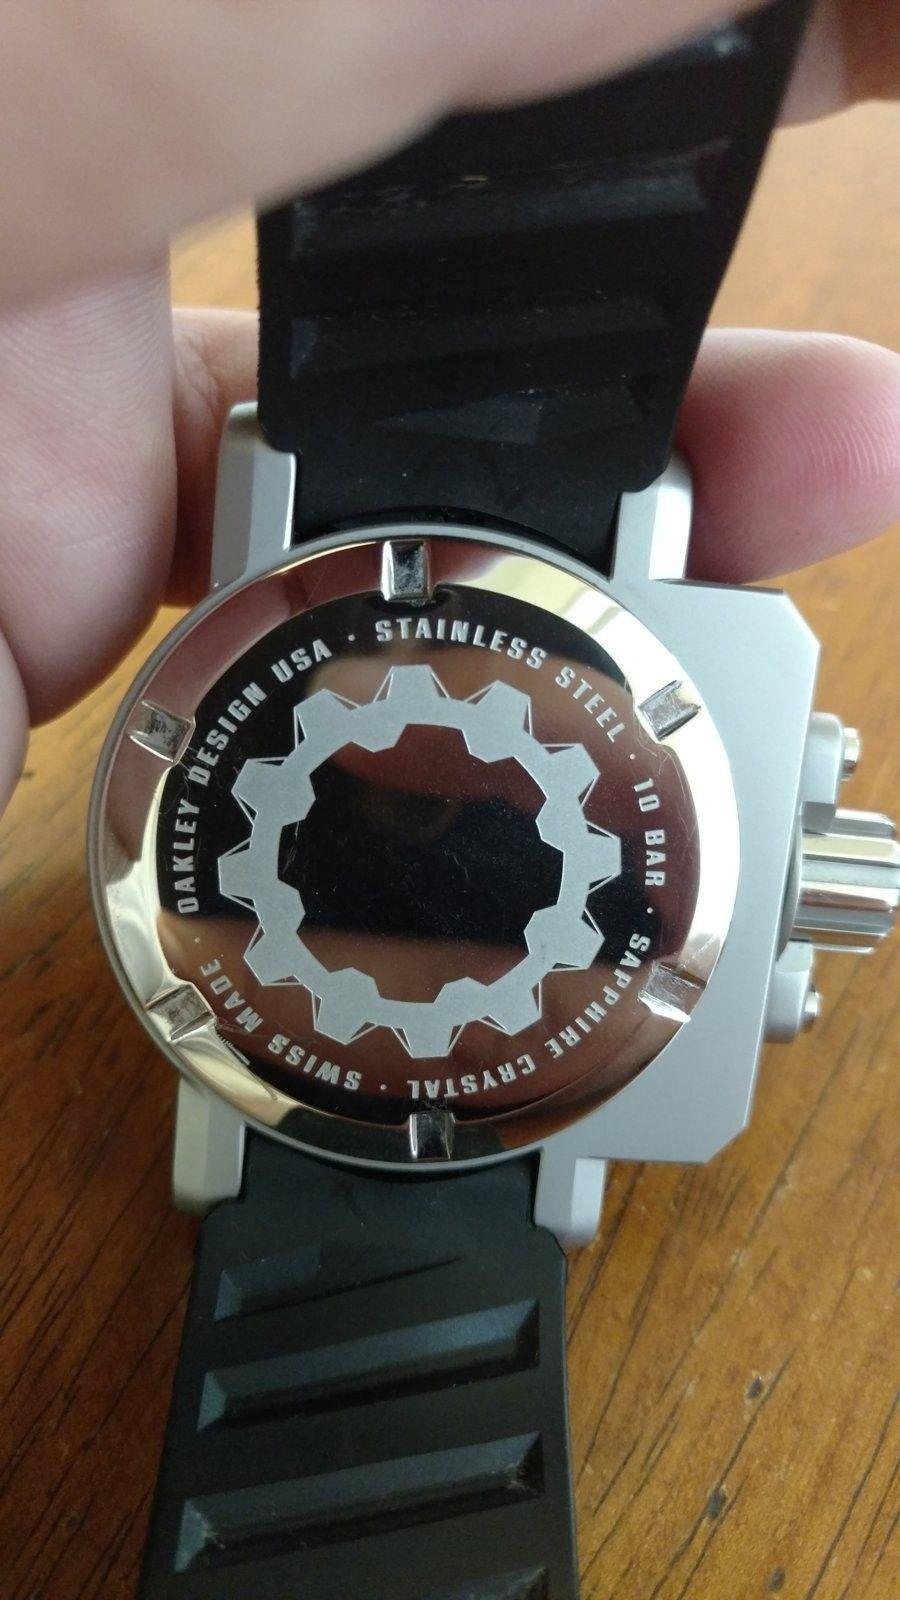 Gearbox Watch - IMG_20160627_102107770.jpg